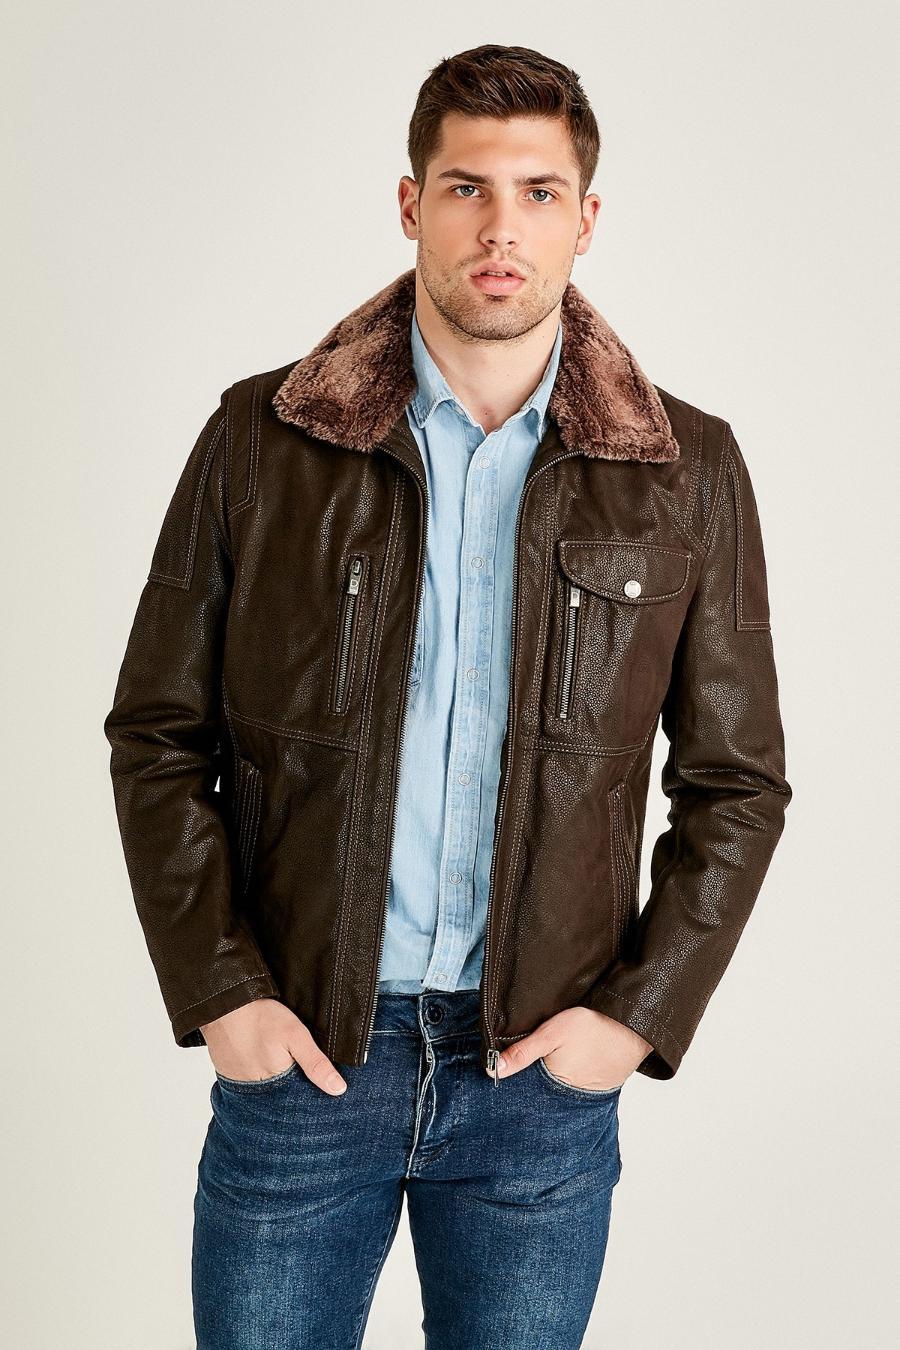 Alaska Leather Jacket with Fur Collar for Men - Dark Brown